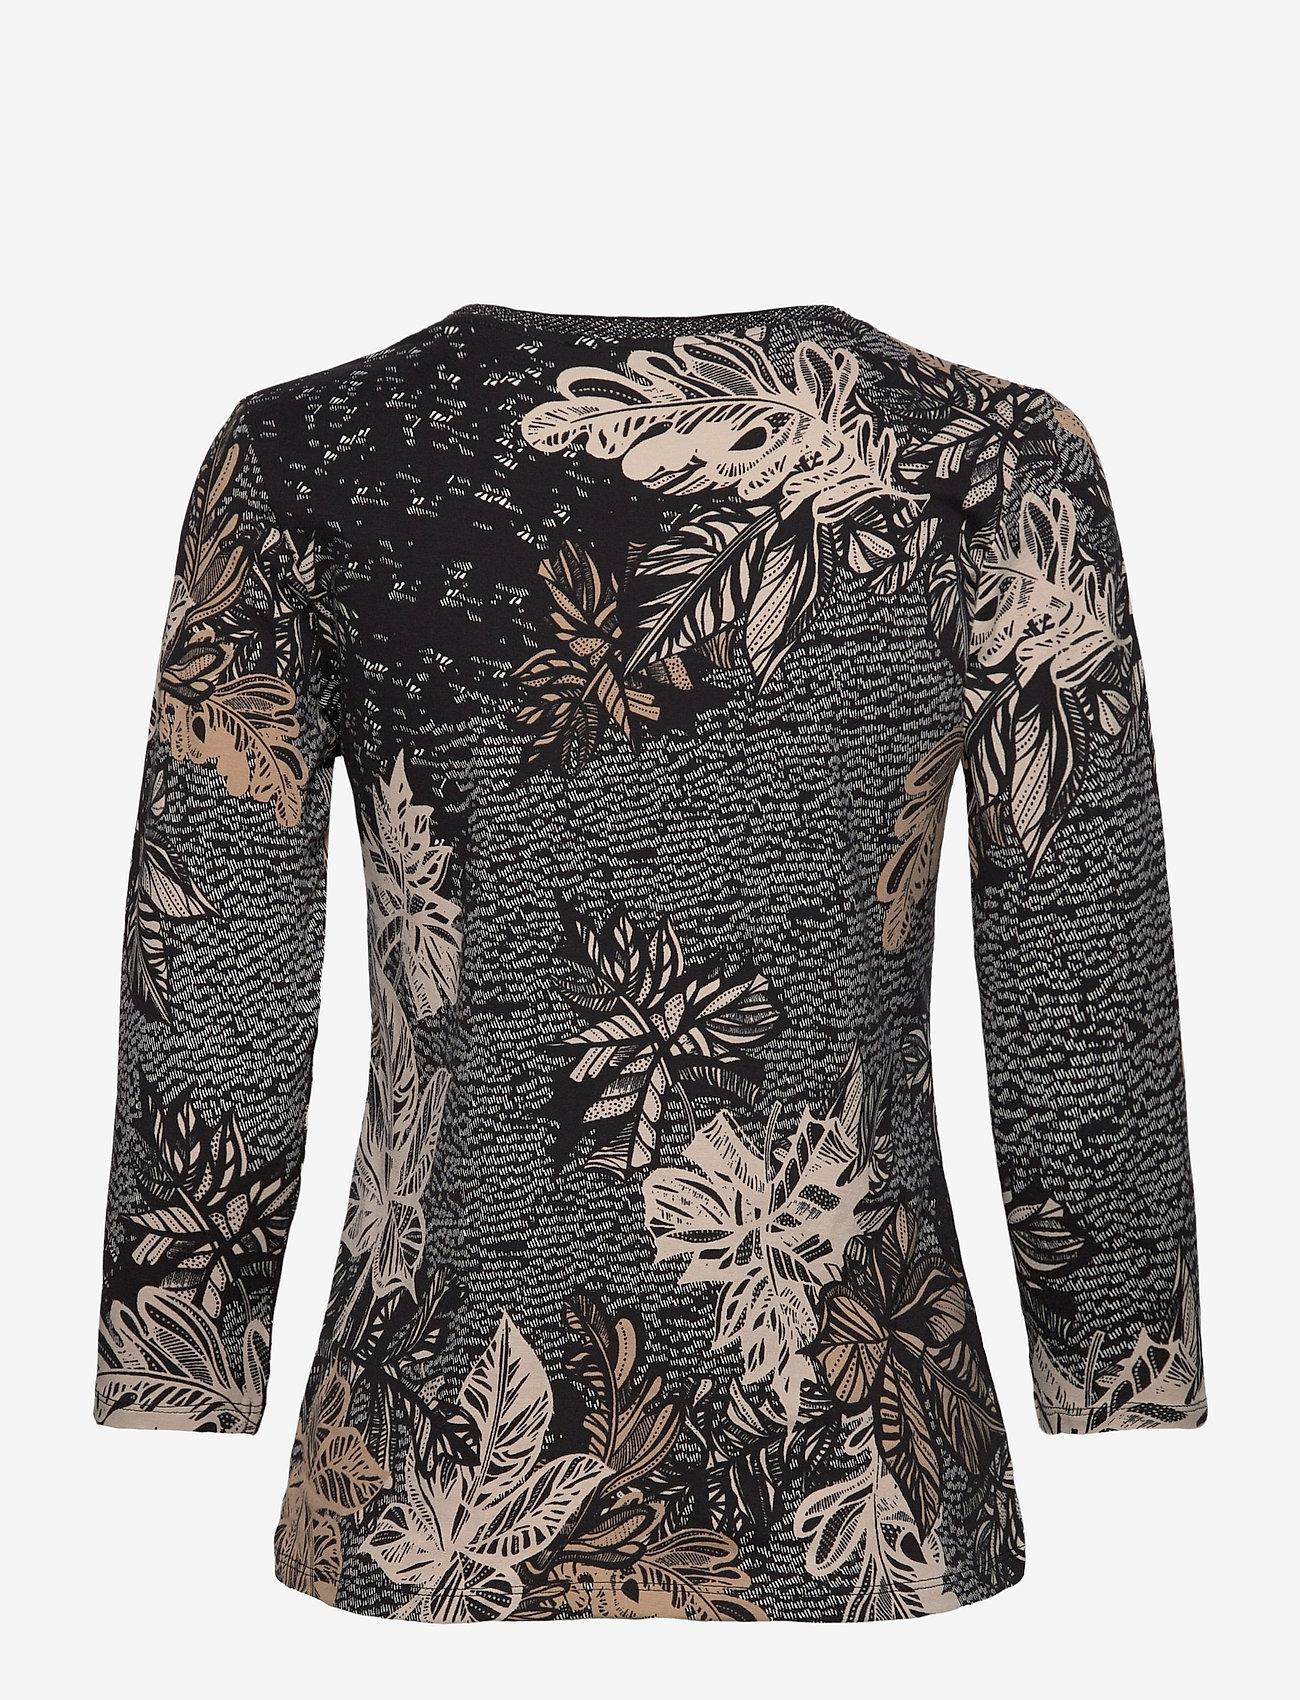 Shirt Short 3/4 Sleeve (Black/stone) (29.99 €) - Betty Barclay OniFz